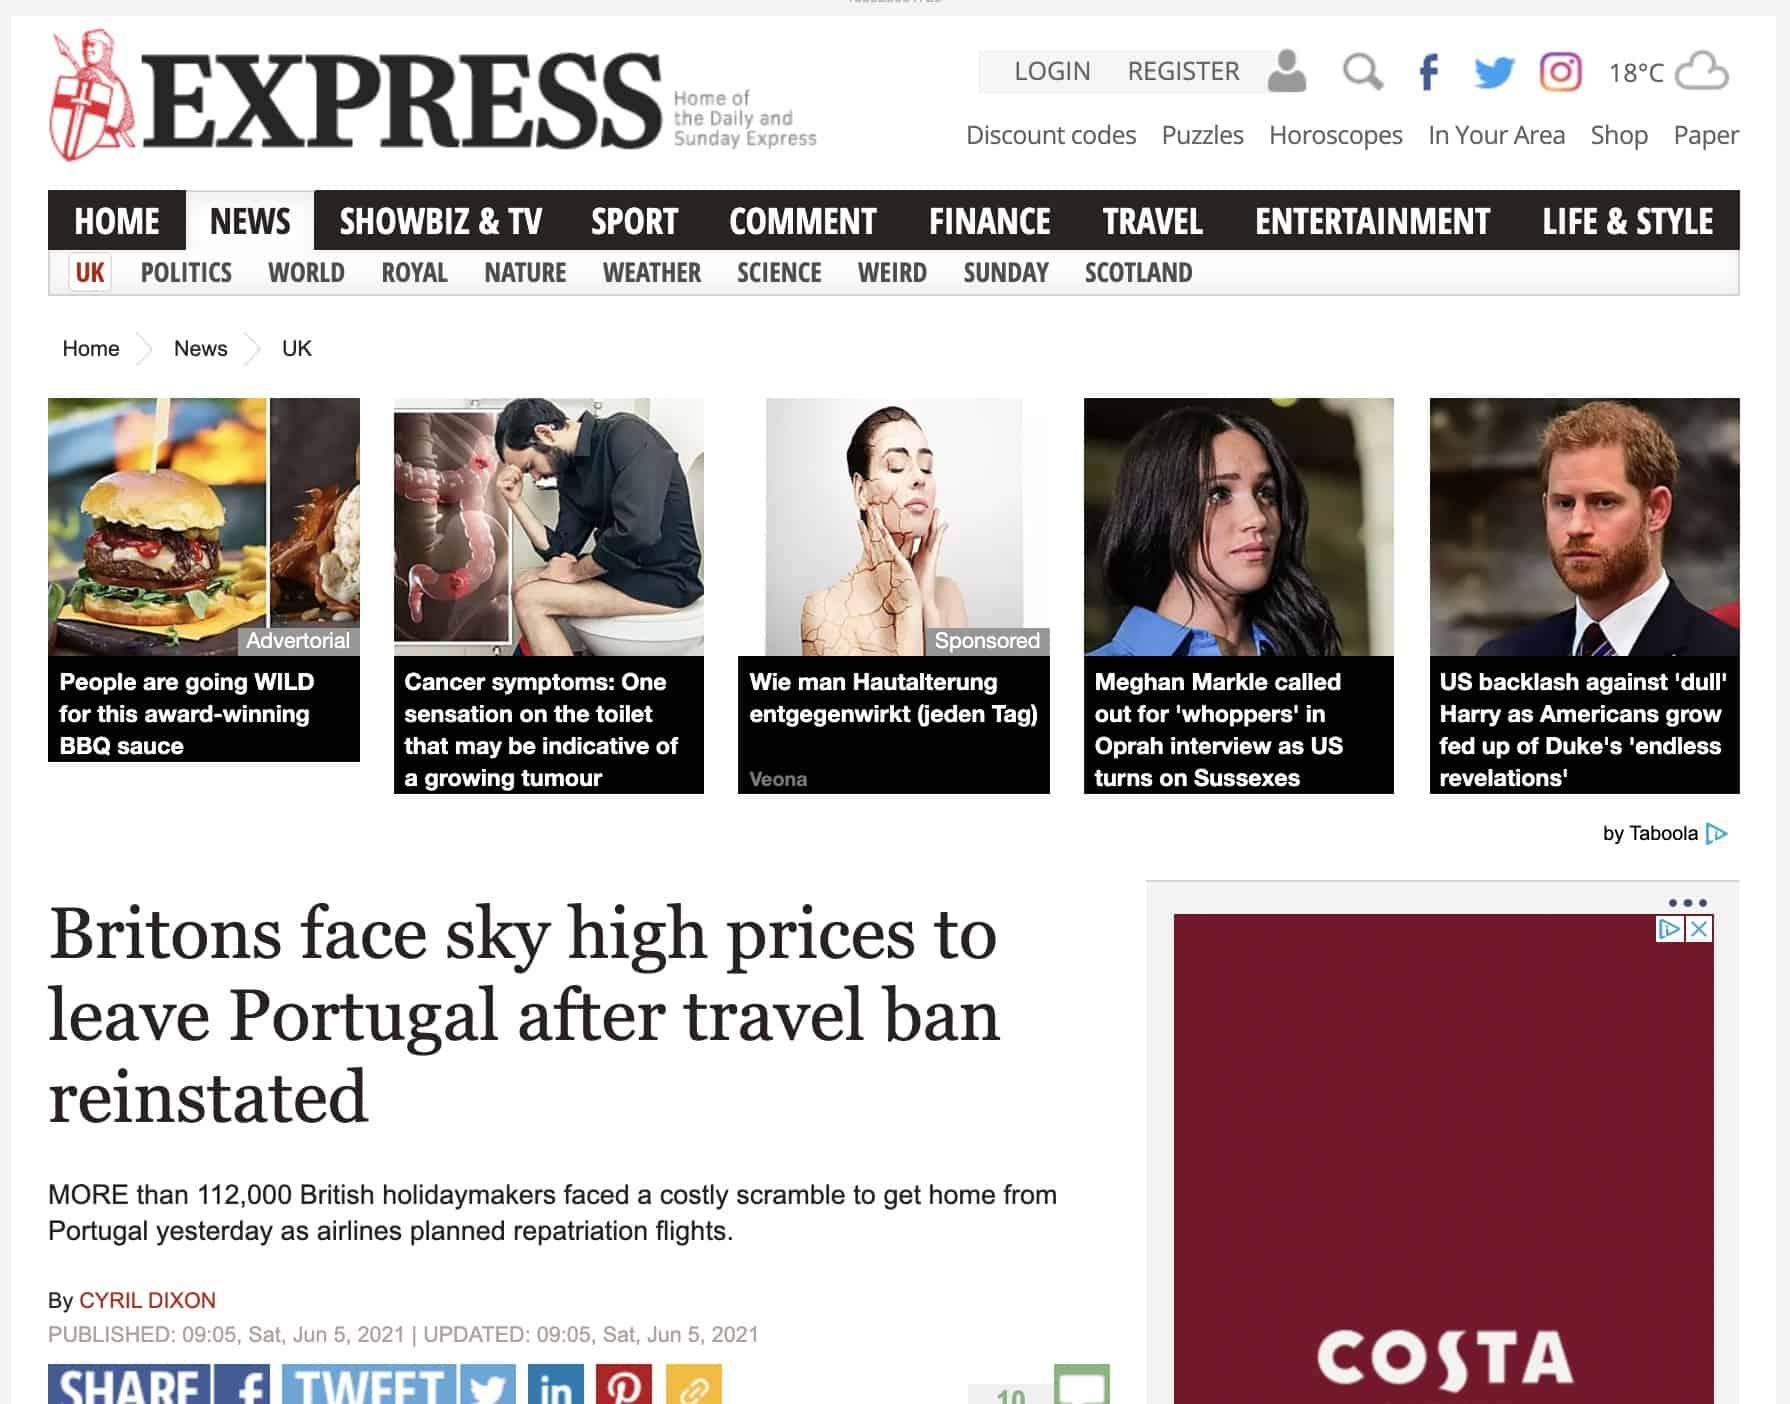 The Express Huq Industries News